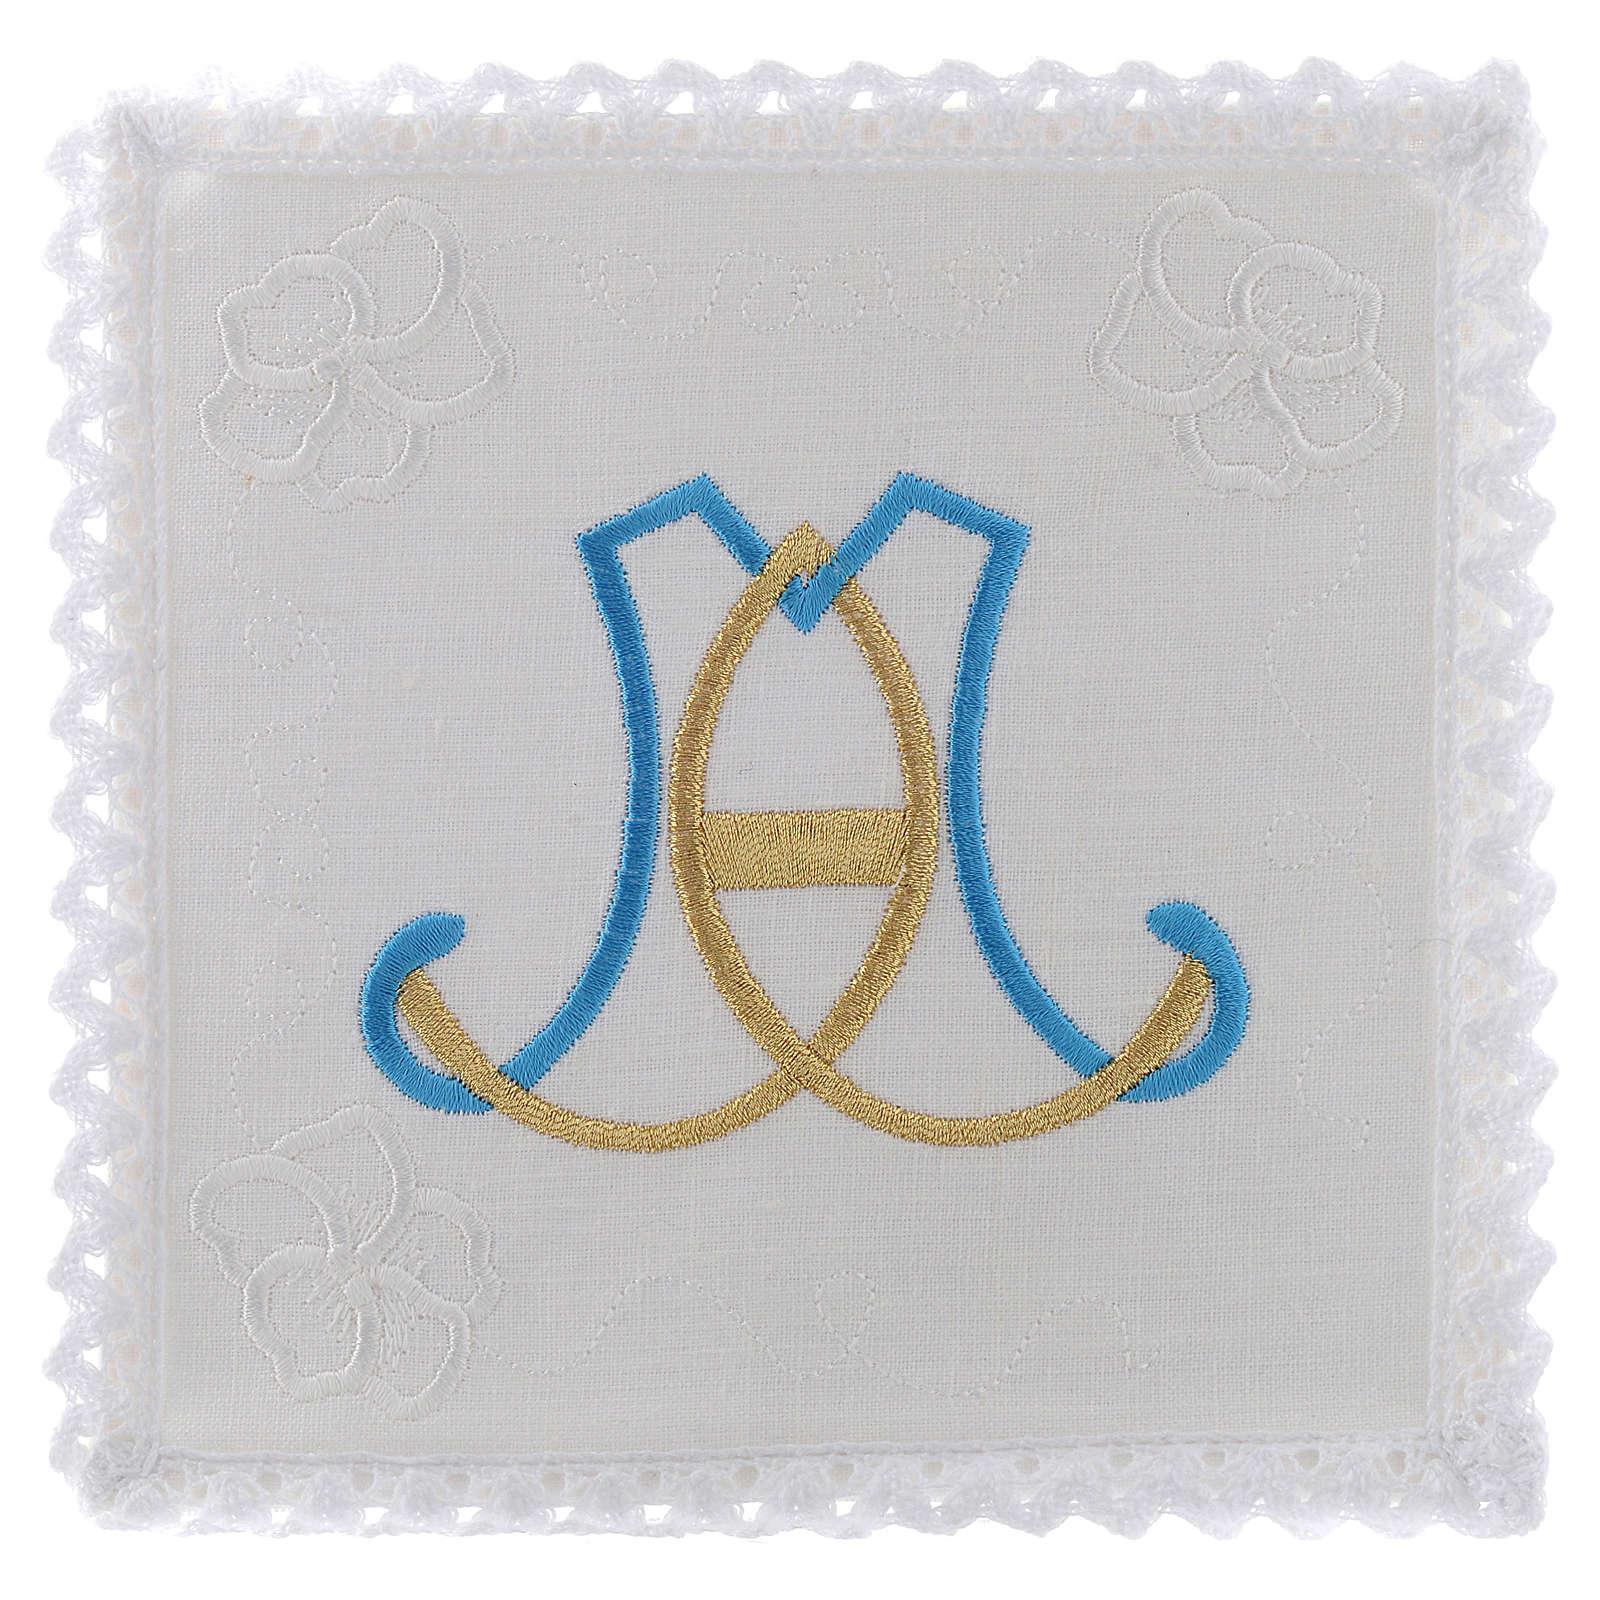 Linge d'autel lin broderie initiales bleu clair or Vierge Marie 4